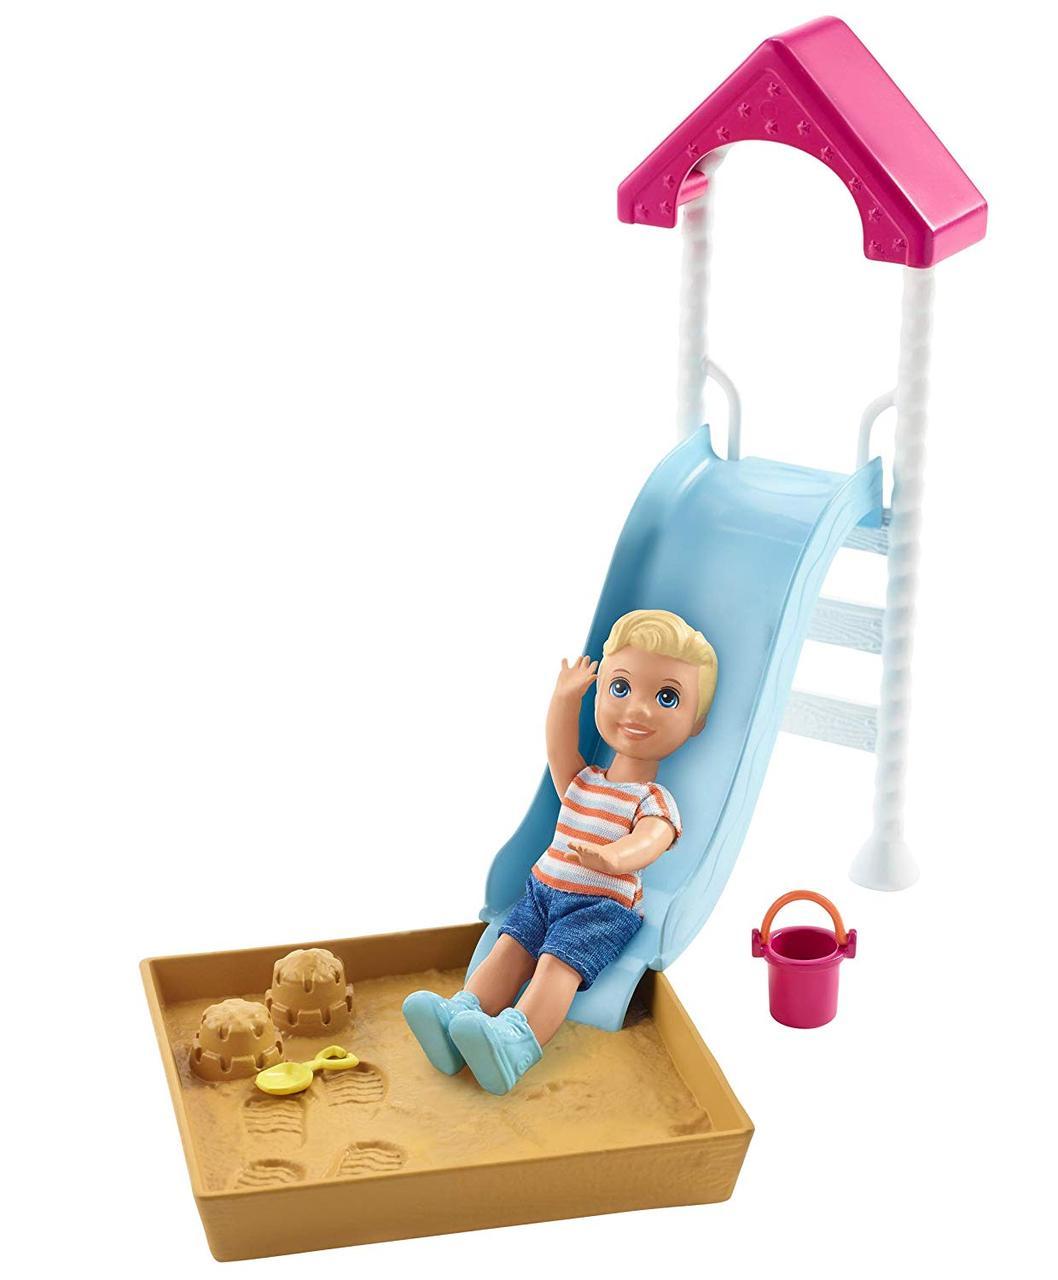 Лялька Барбі Скіппер Дитячий майданчик Barbie Skipper Babysitters Inc. Playground Playset